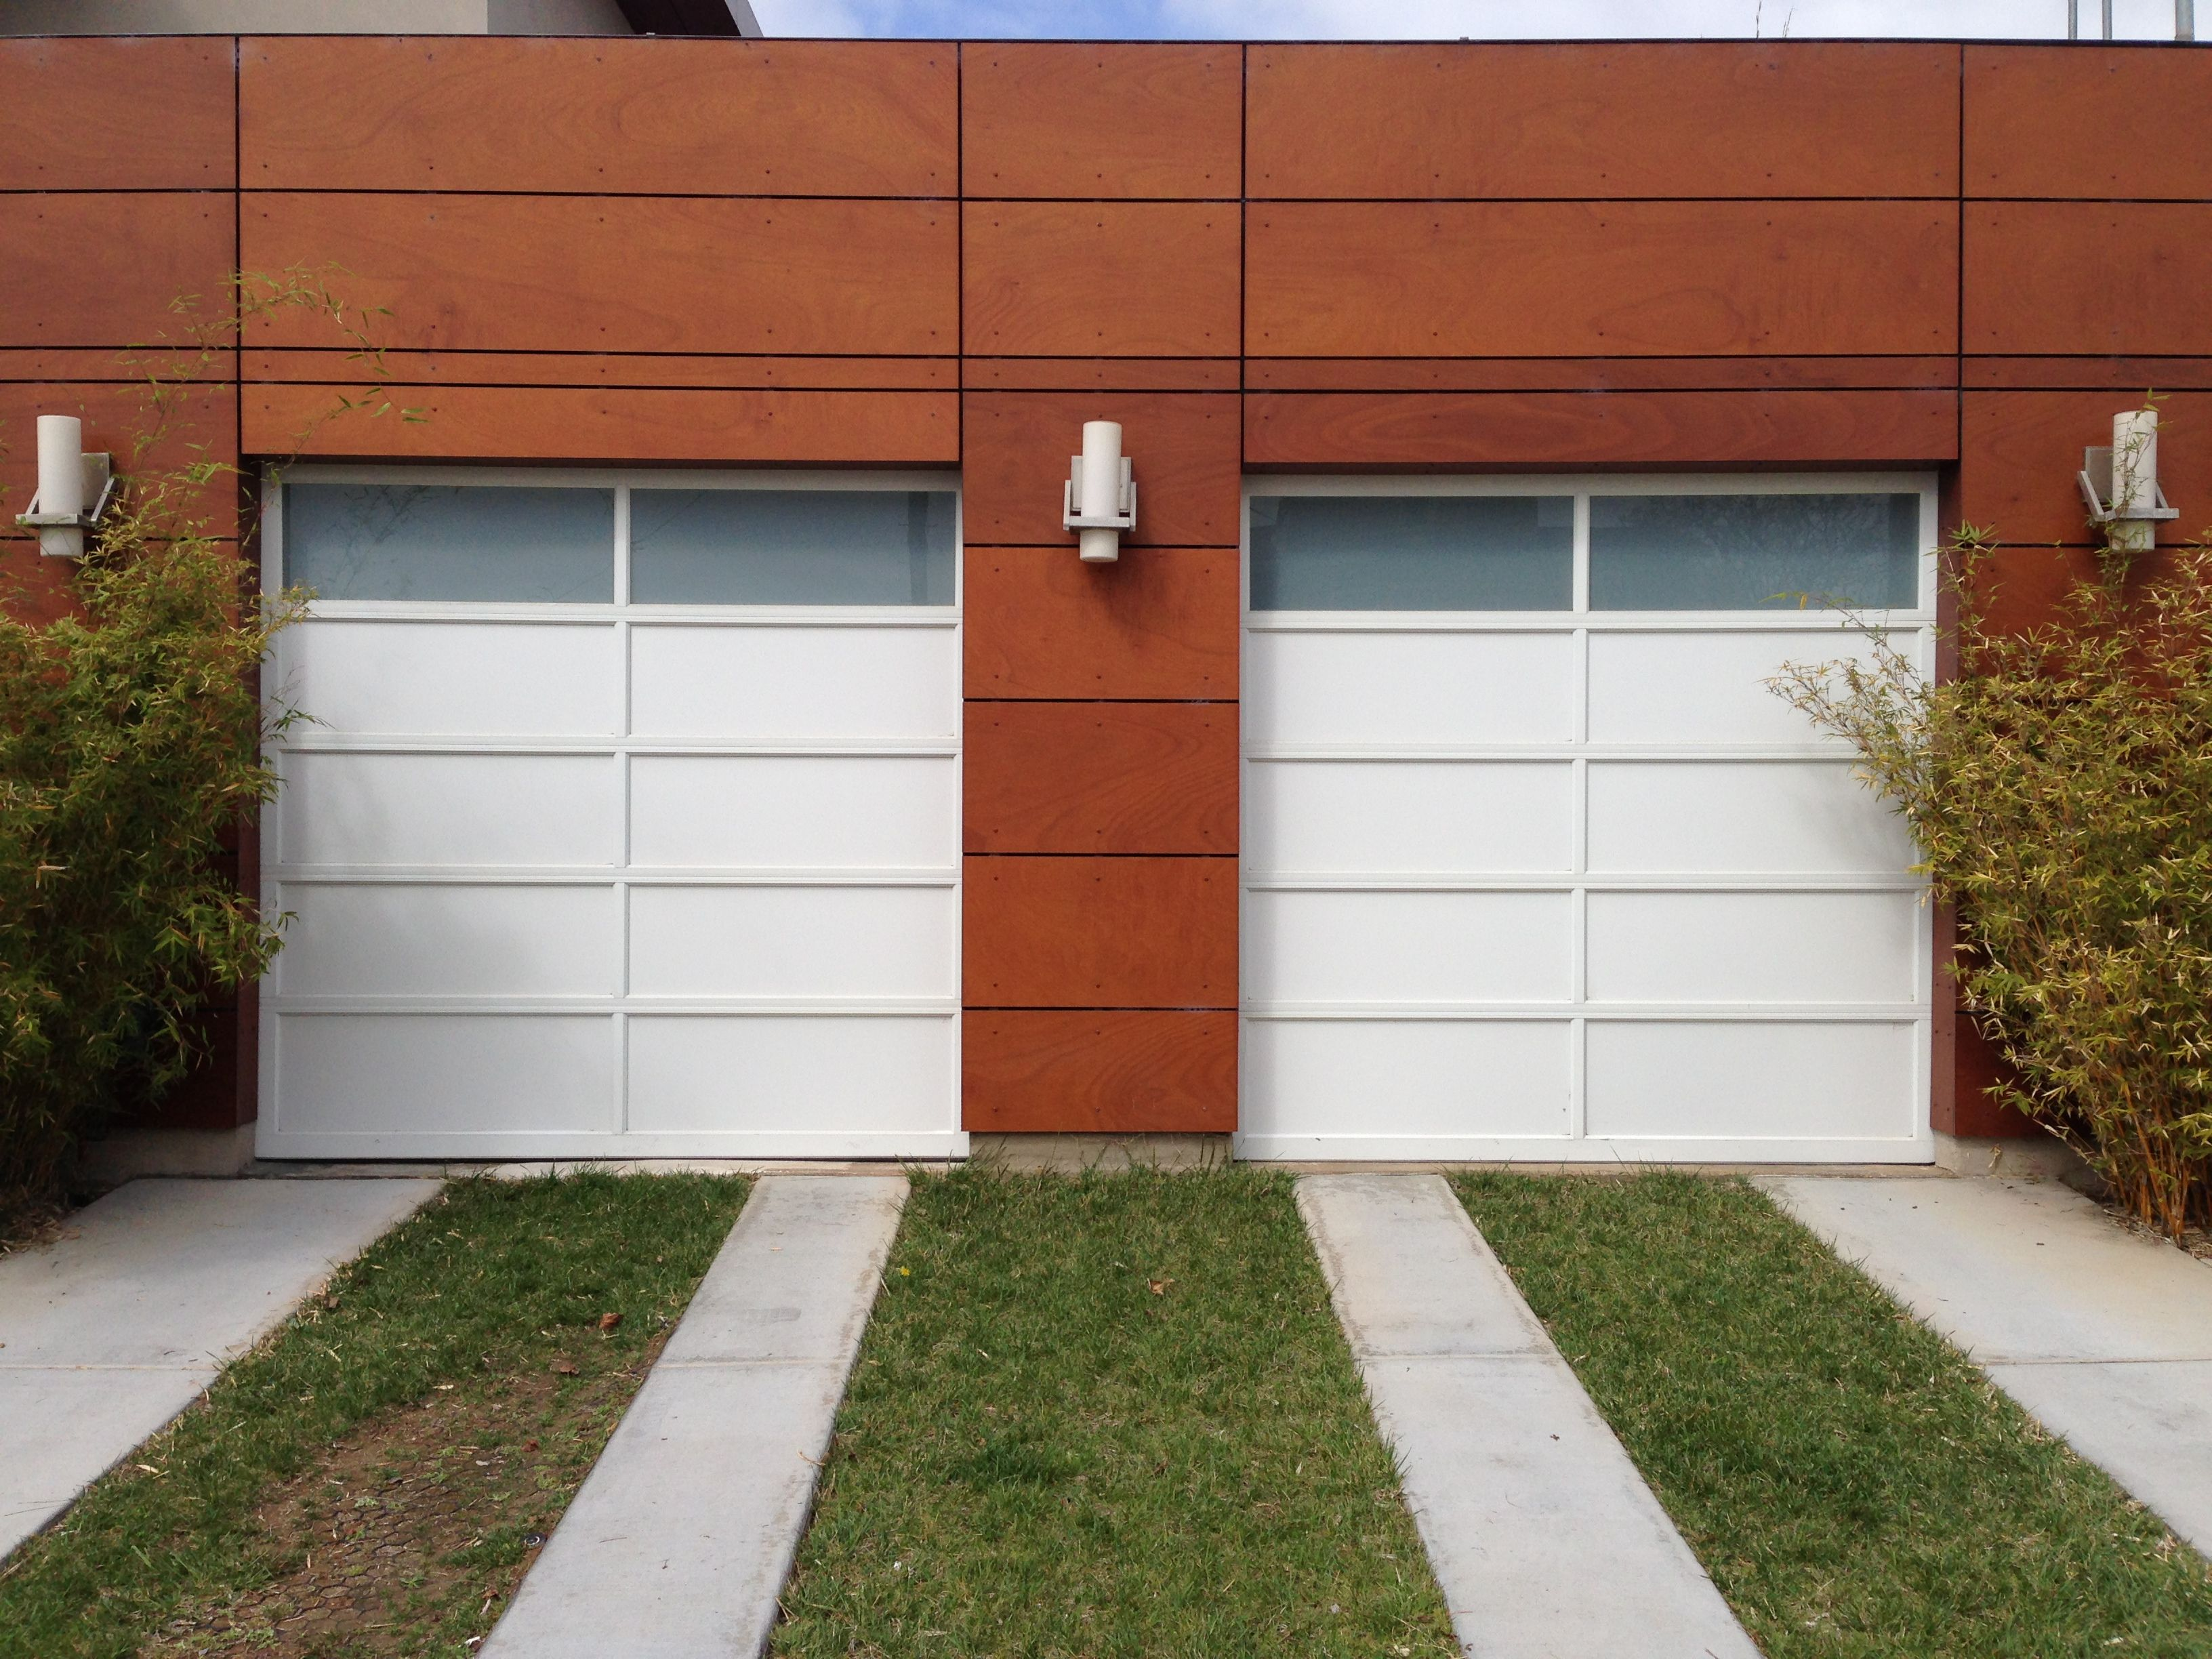 Clopay doors avante aluminum pannel with obscure privacy glass clopay doors avante aluminum pannel with obscure privacy glass white powder coated overhead garage rubansaba